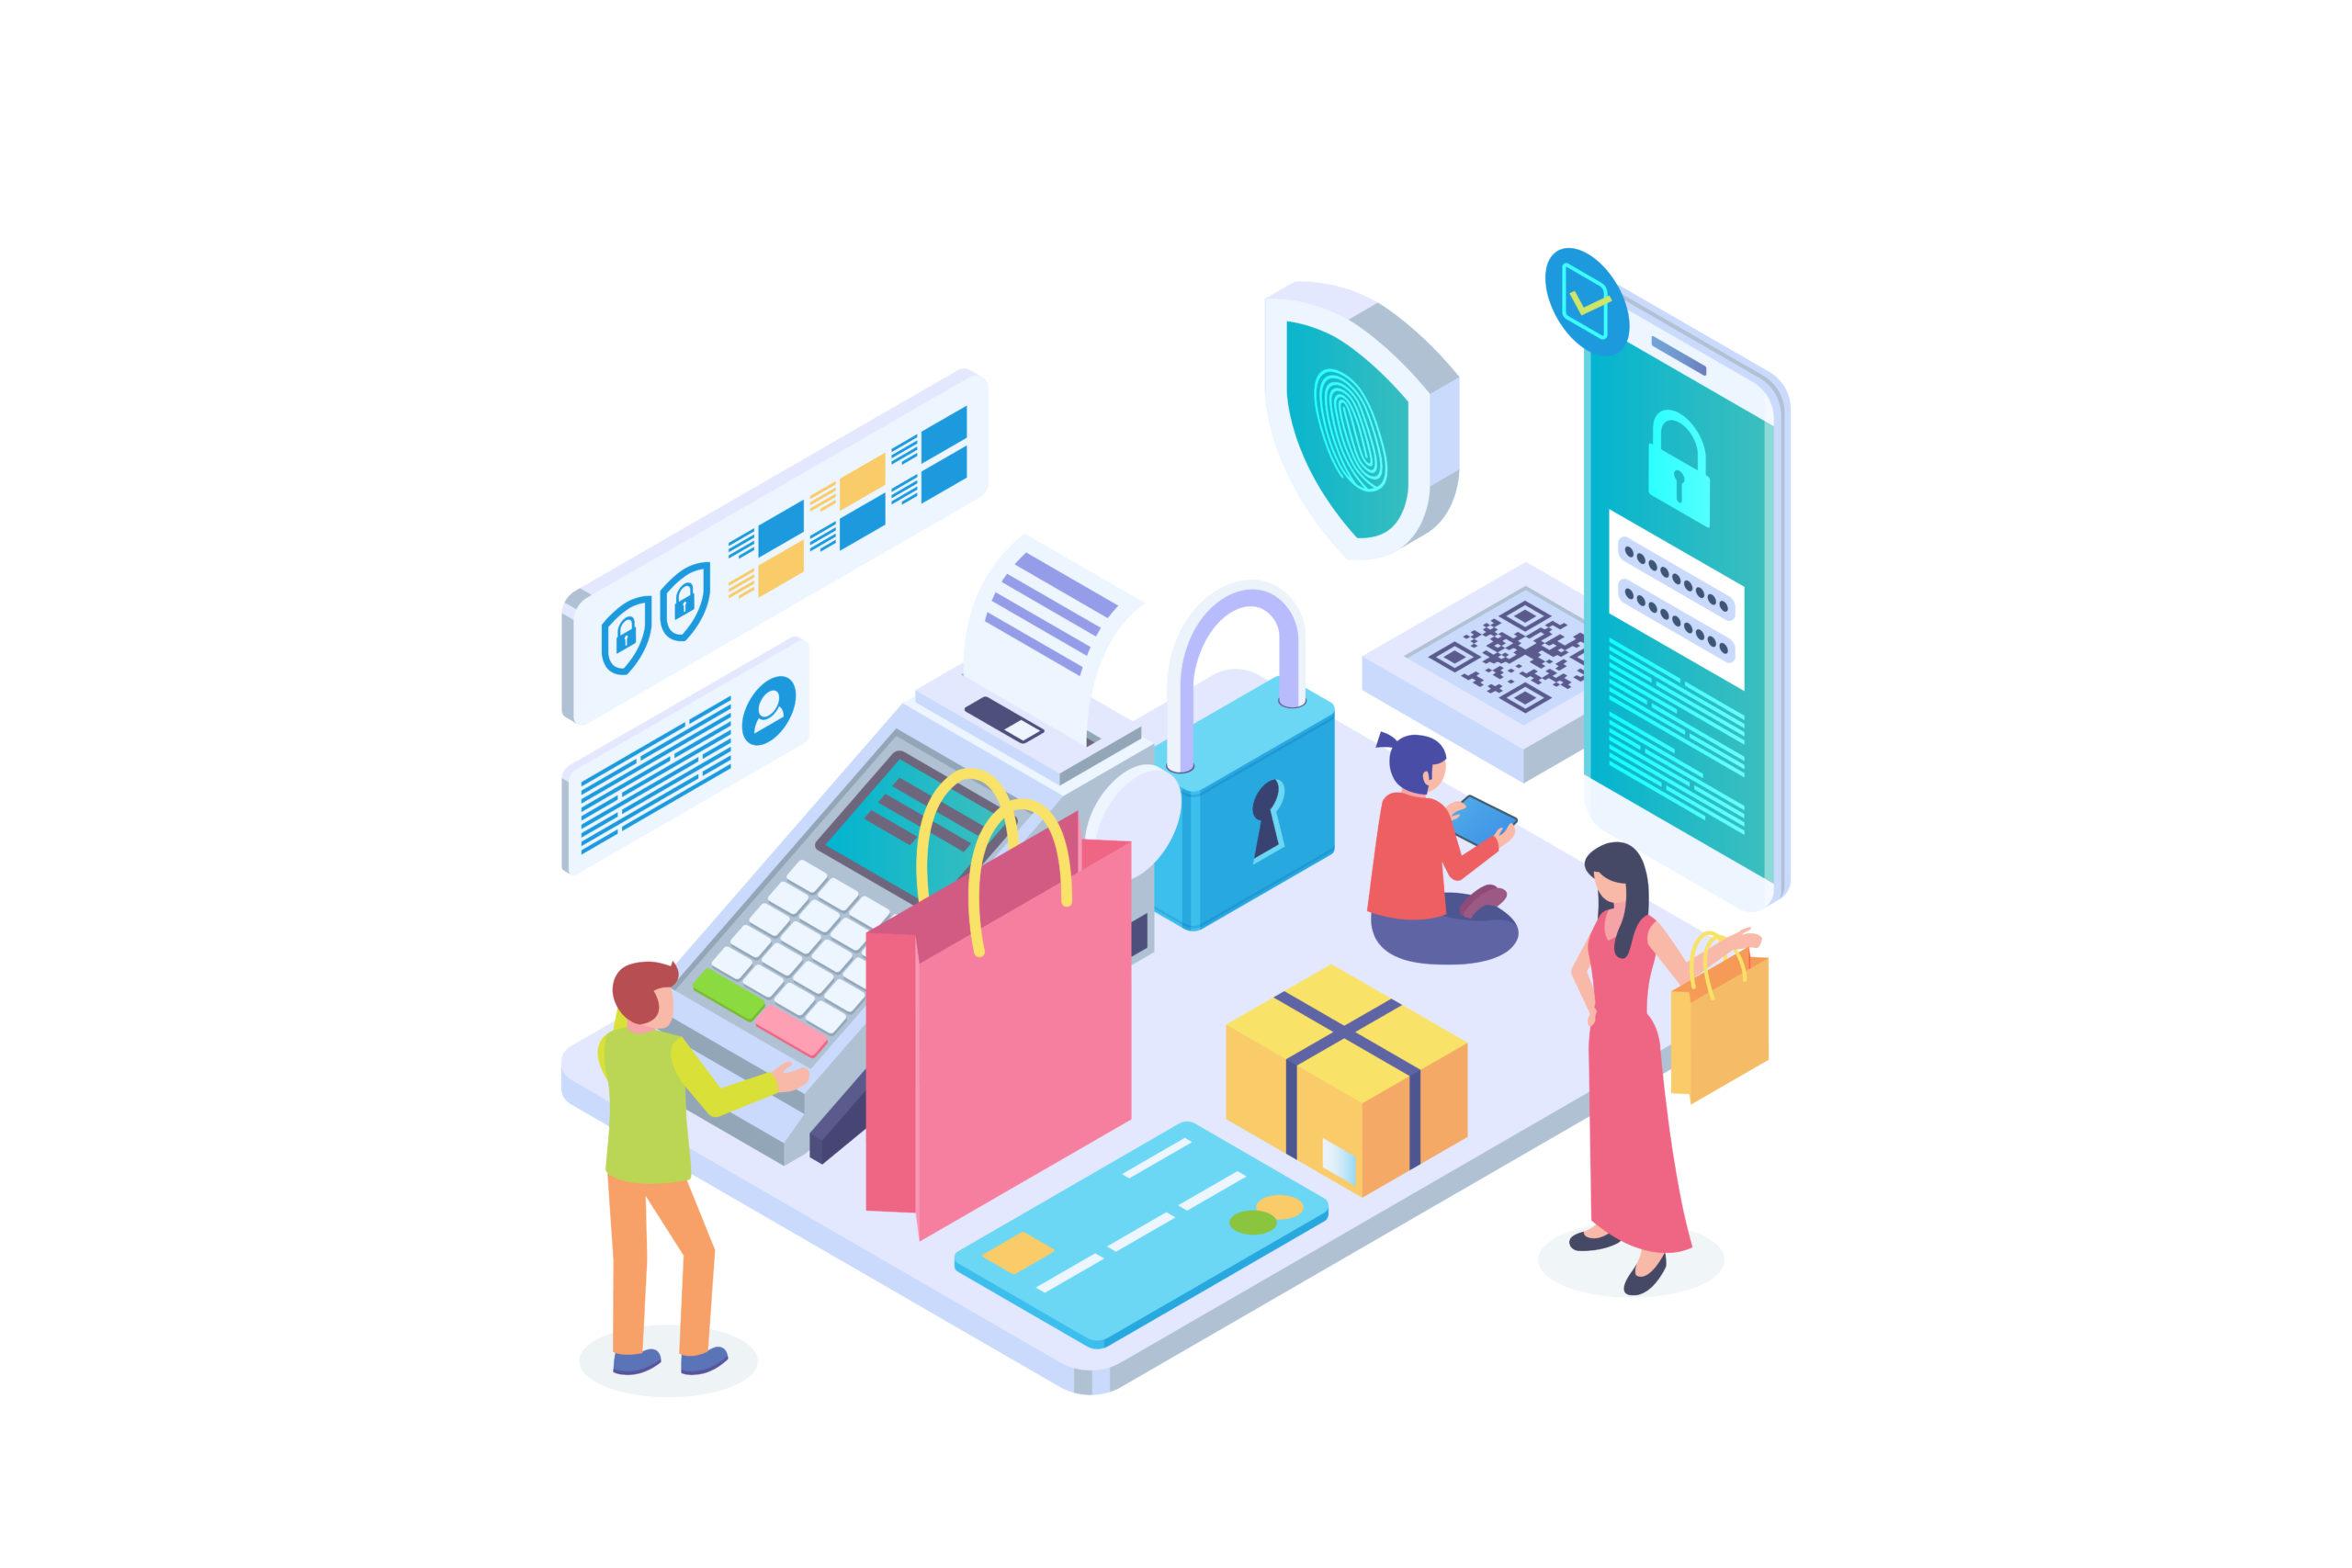 Global Fintech Industry trends 2021